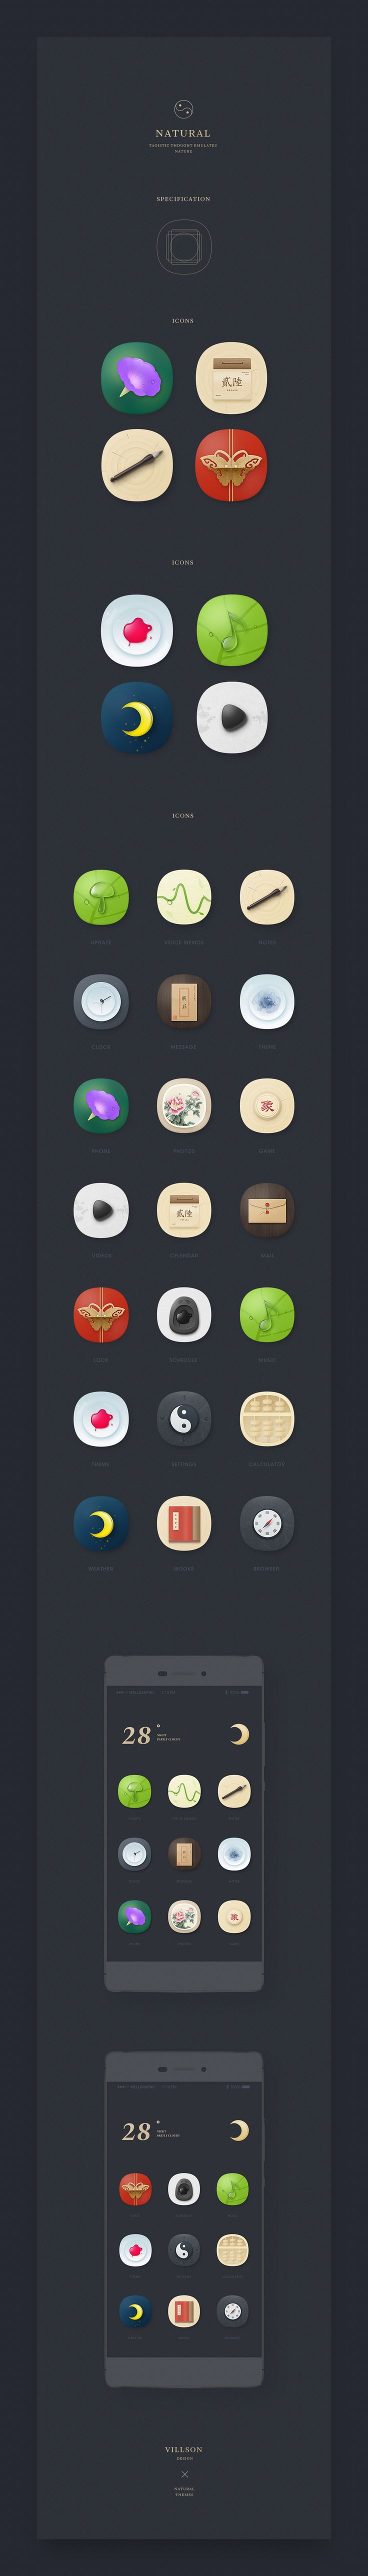 icons design on Behance